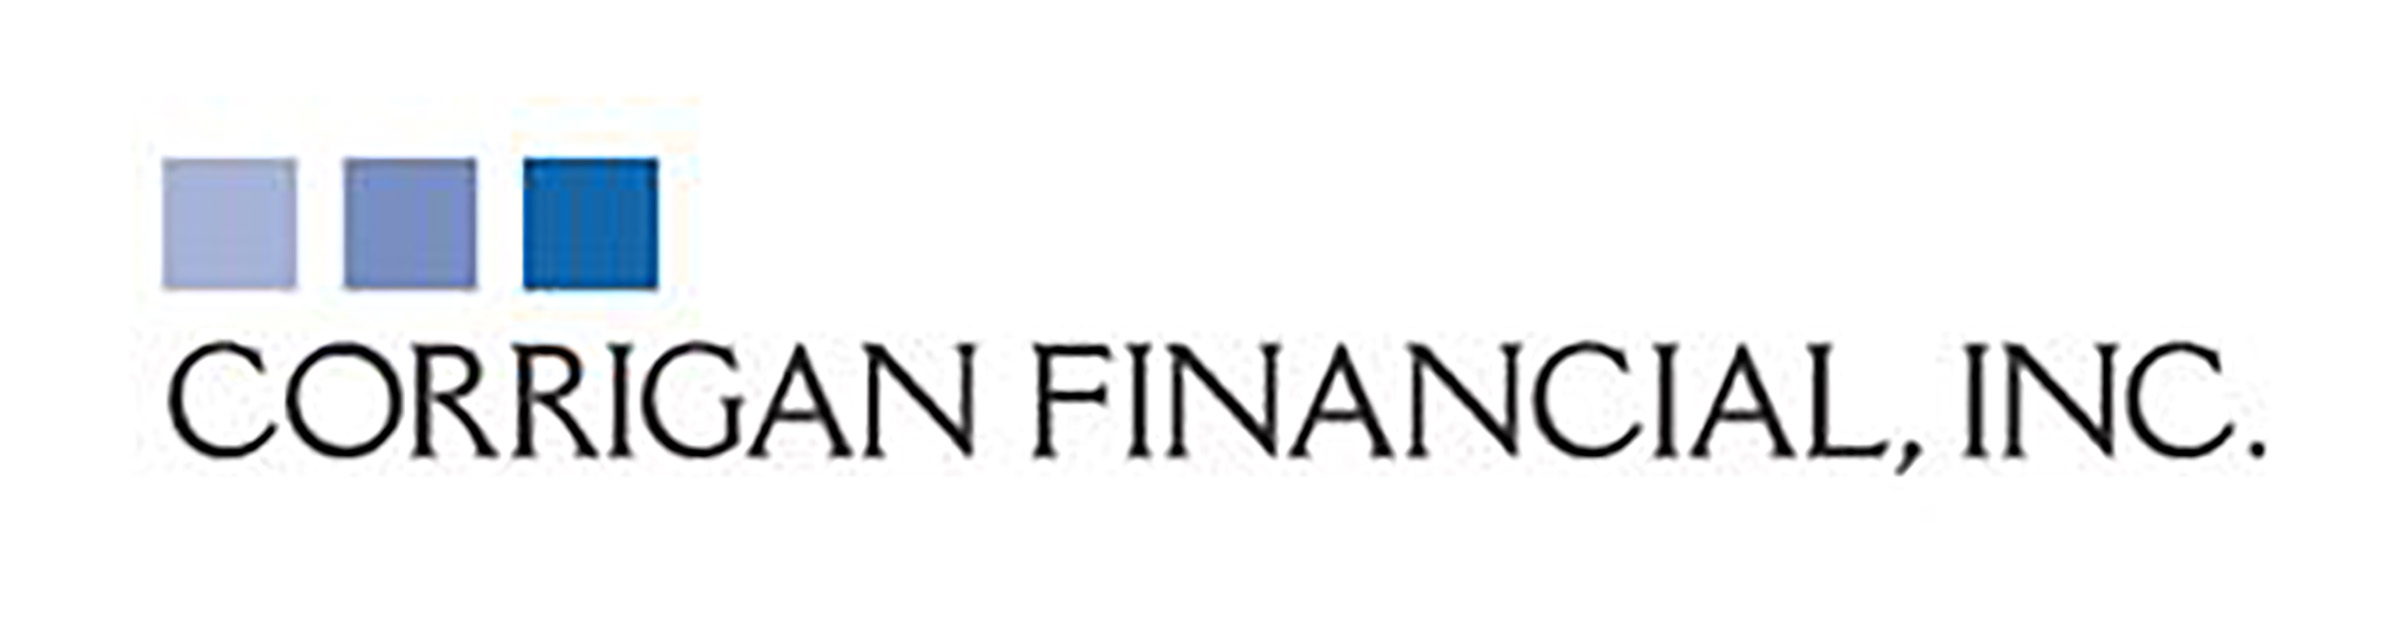 Corrigan Financial, Inc